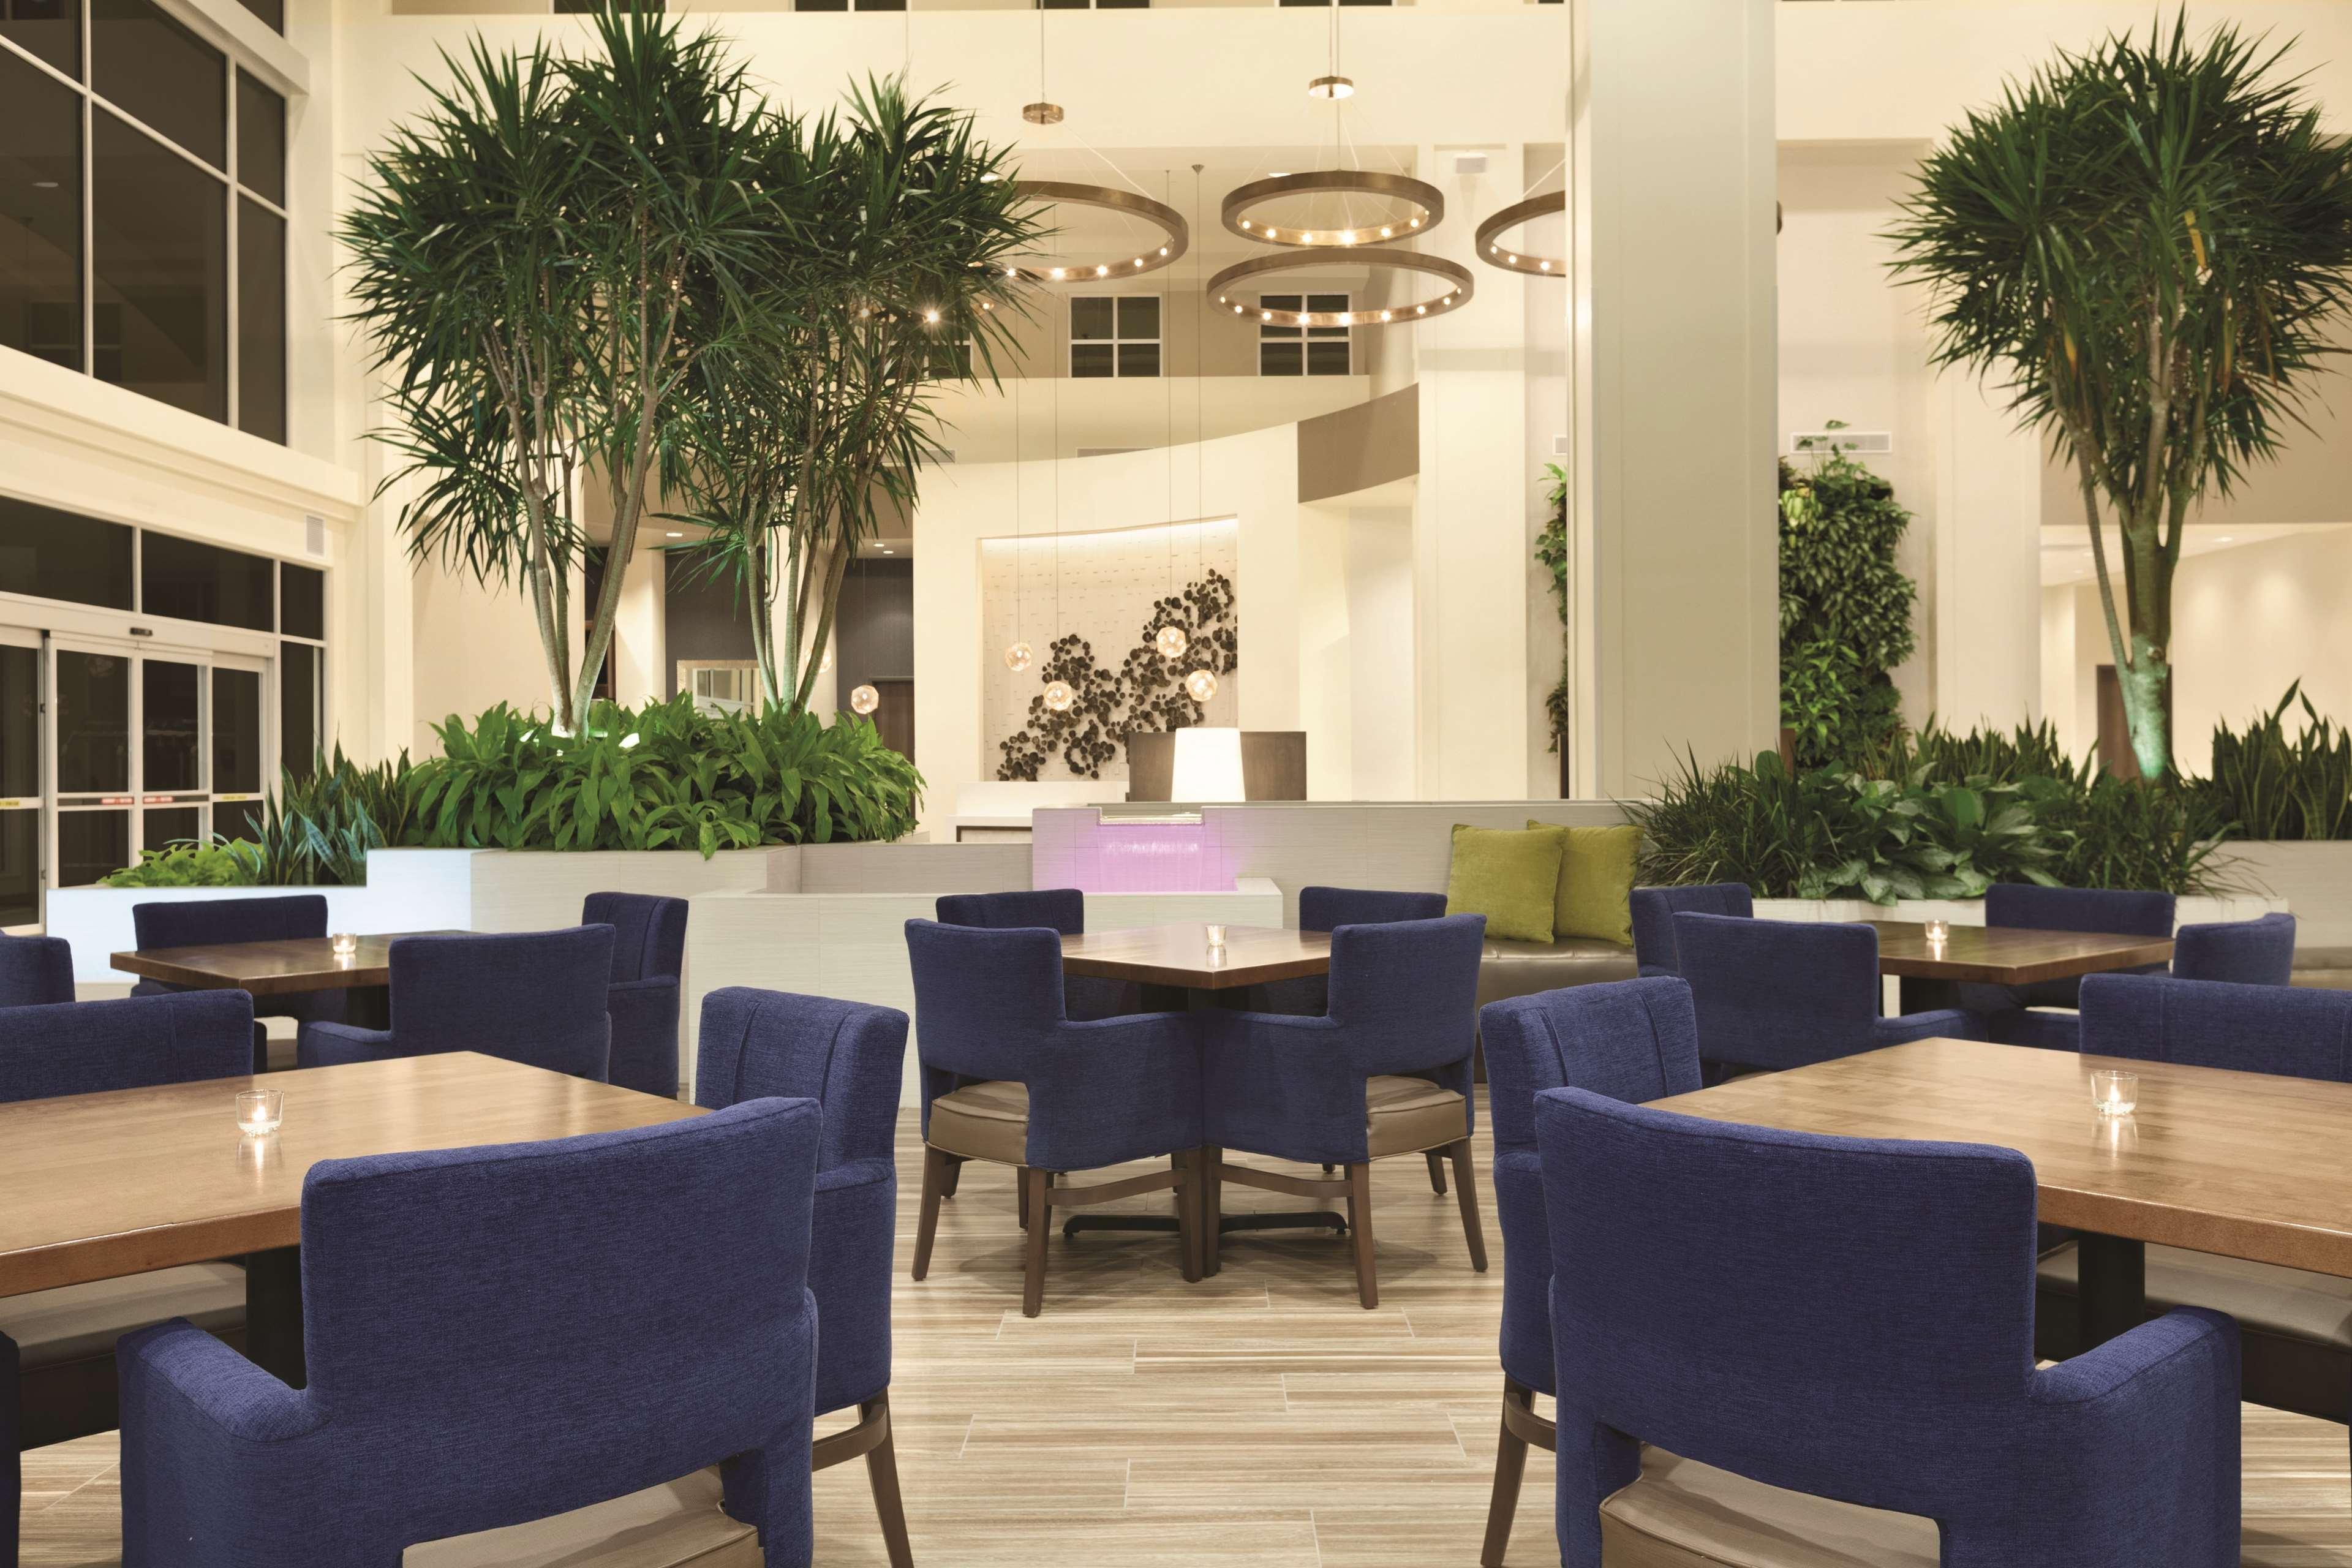 Embassy Suites by Hilton Portland Hillsboro, Oregon image 37